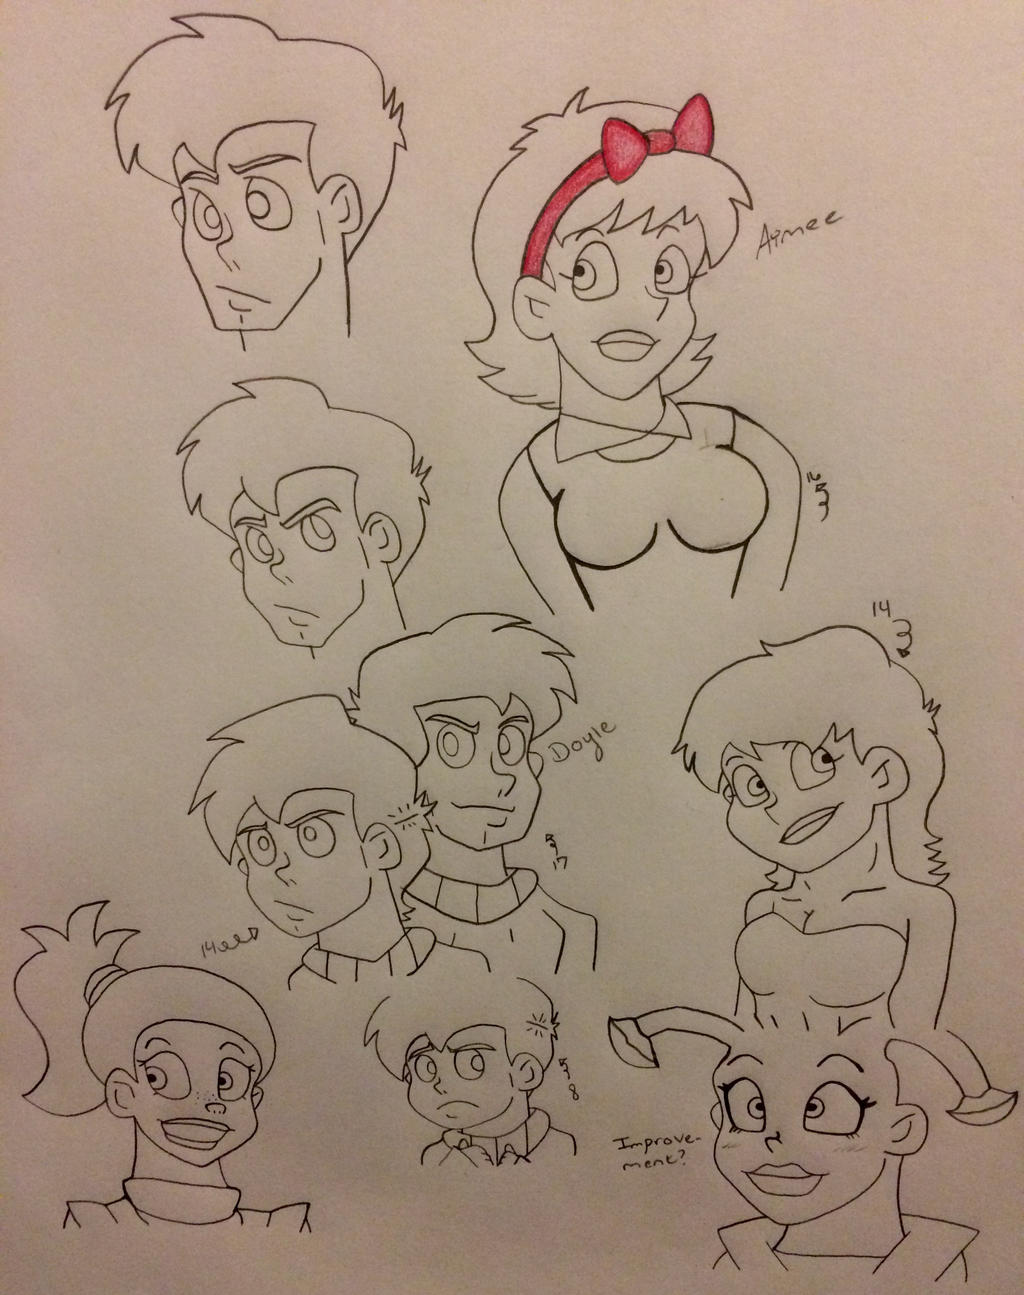 galaxy high doodles by Ashartz123